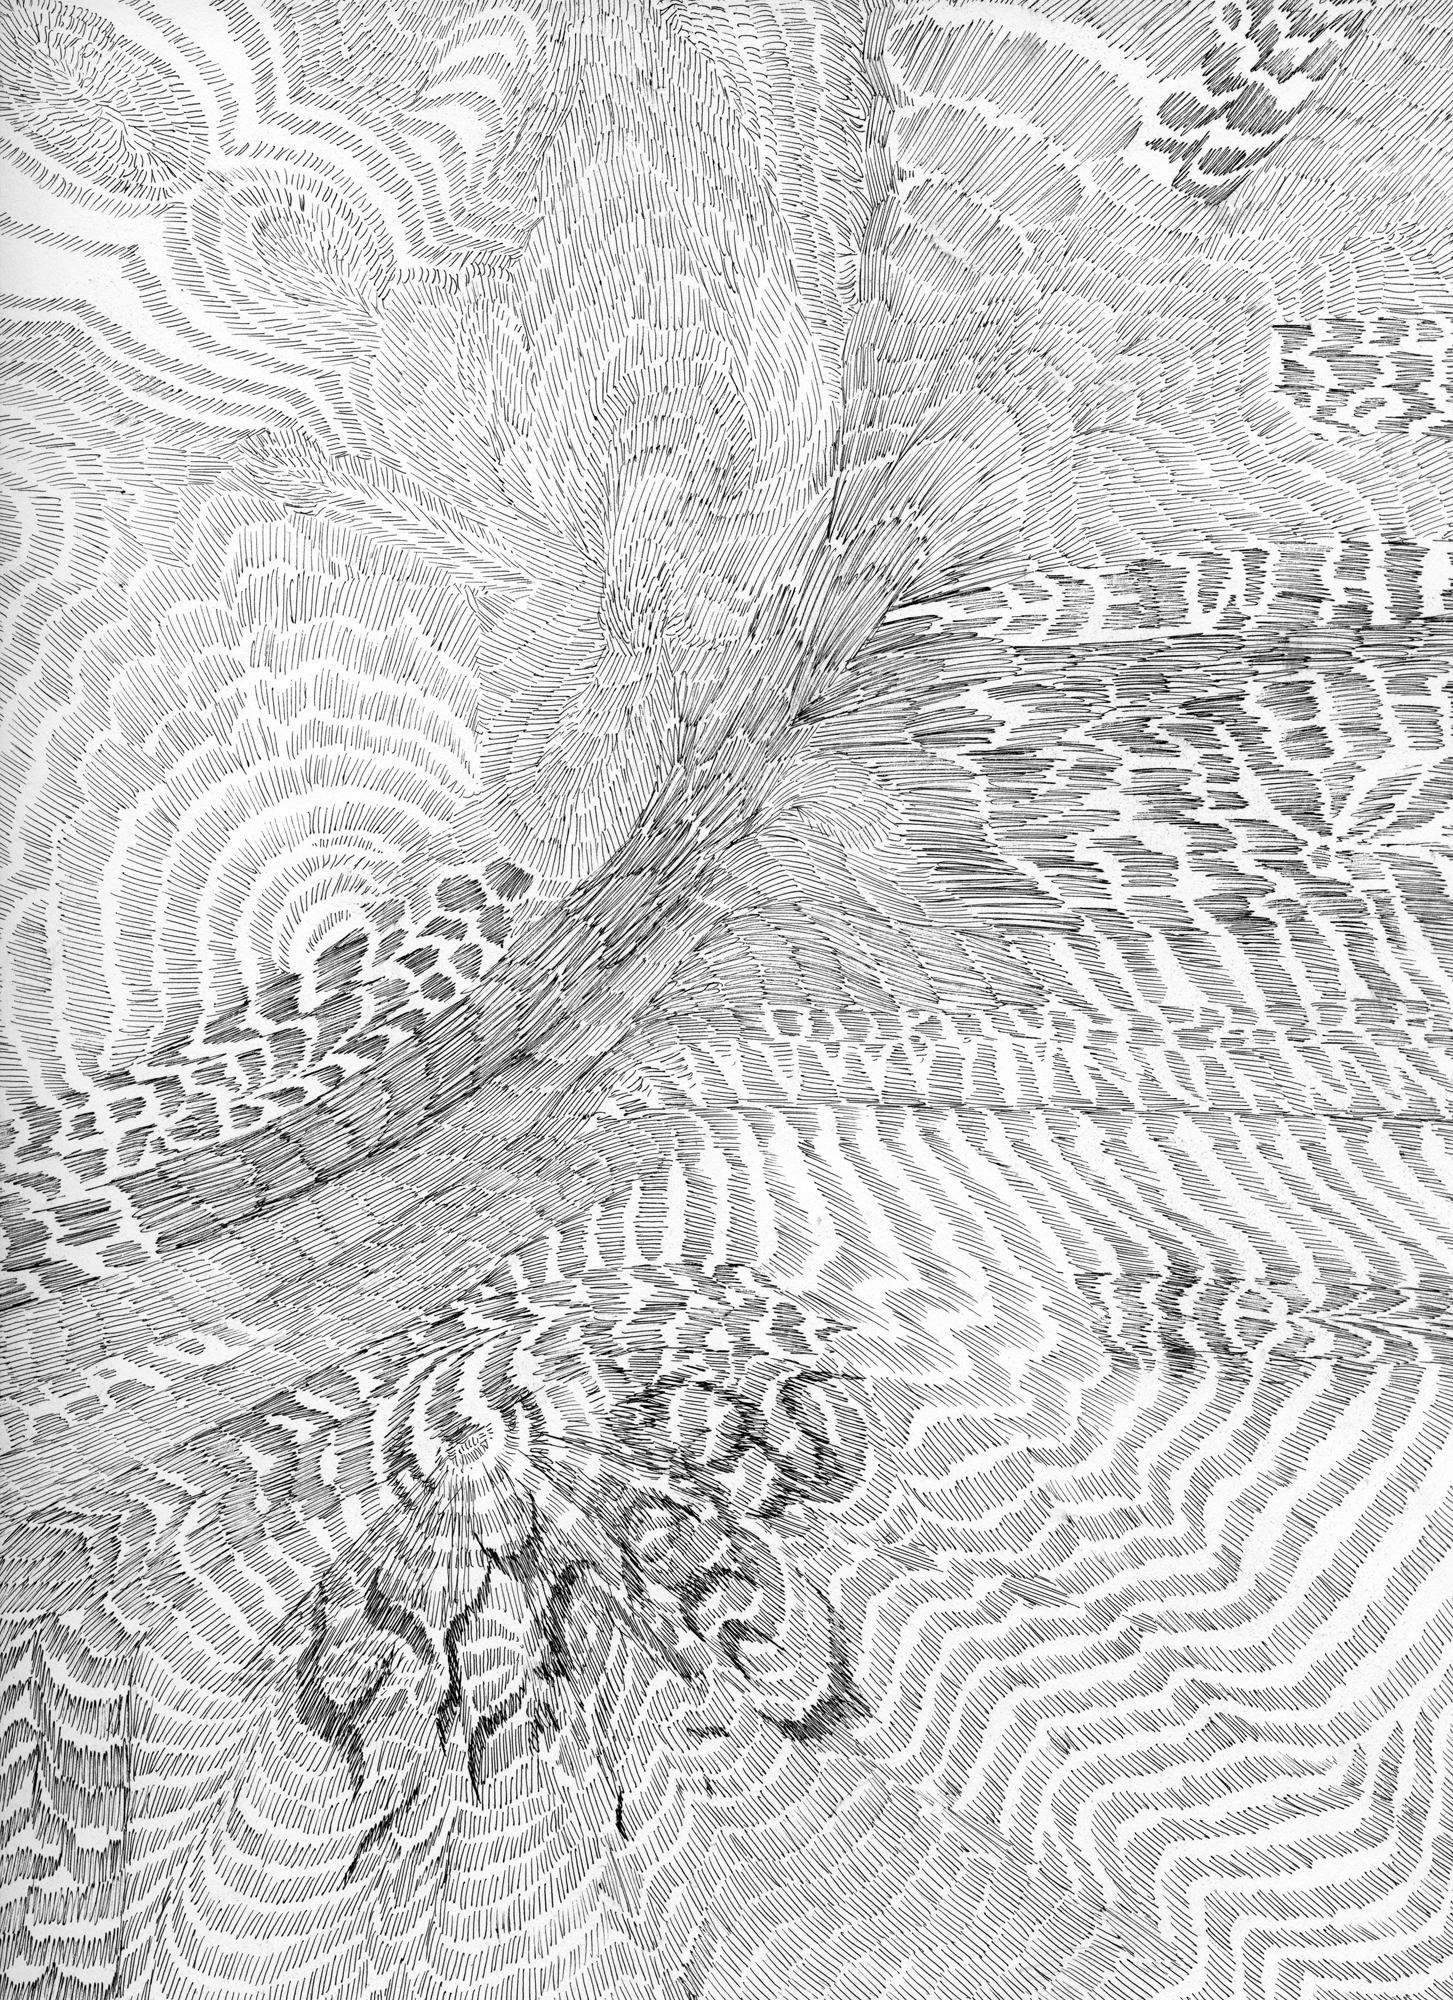 Untitled (Flux 04.30),  2019 Ink on paper 30.4 cm x 22.8 cm